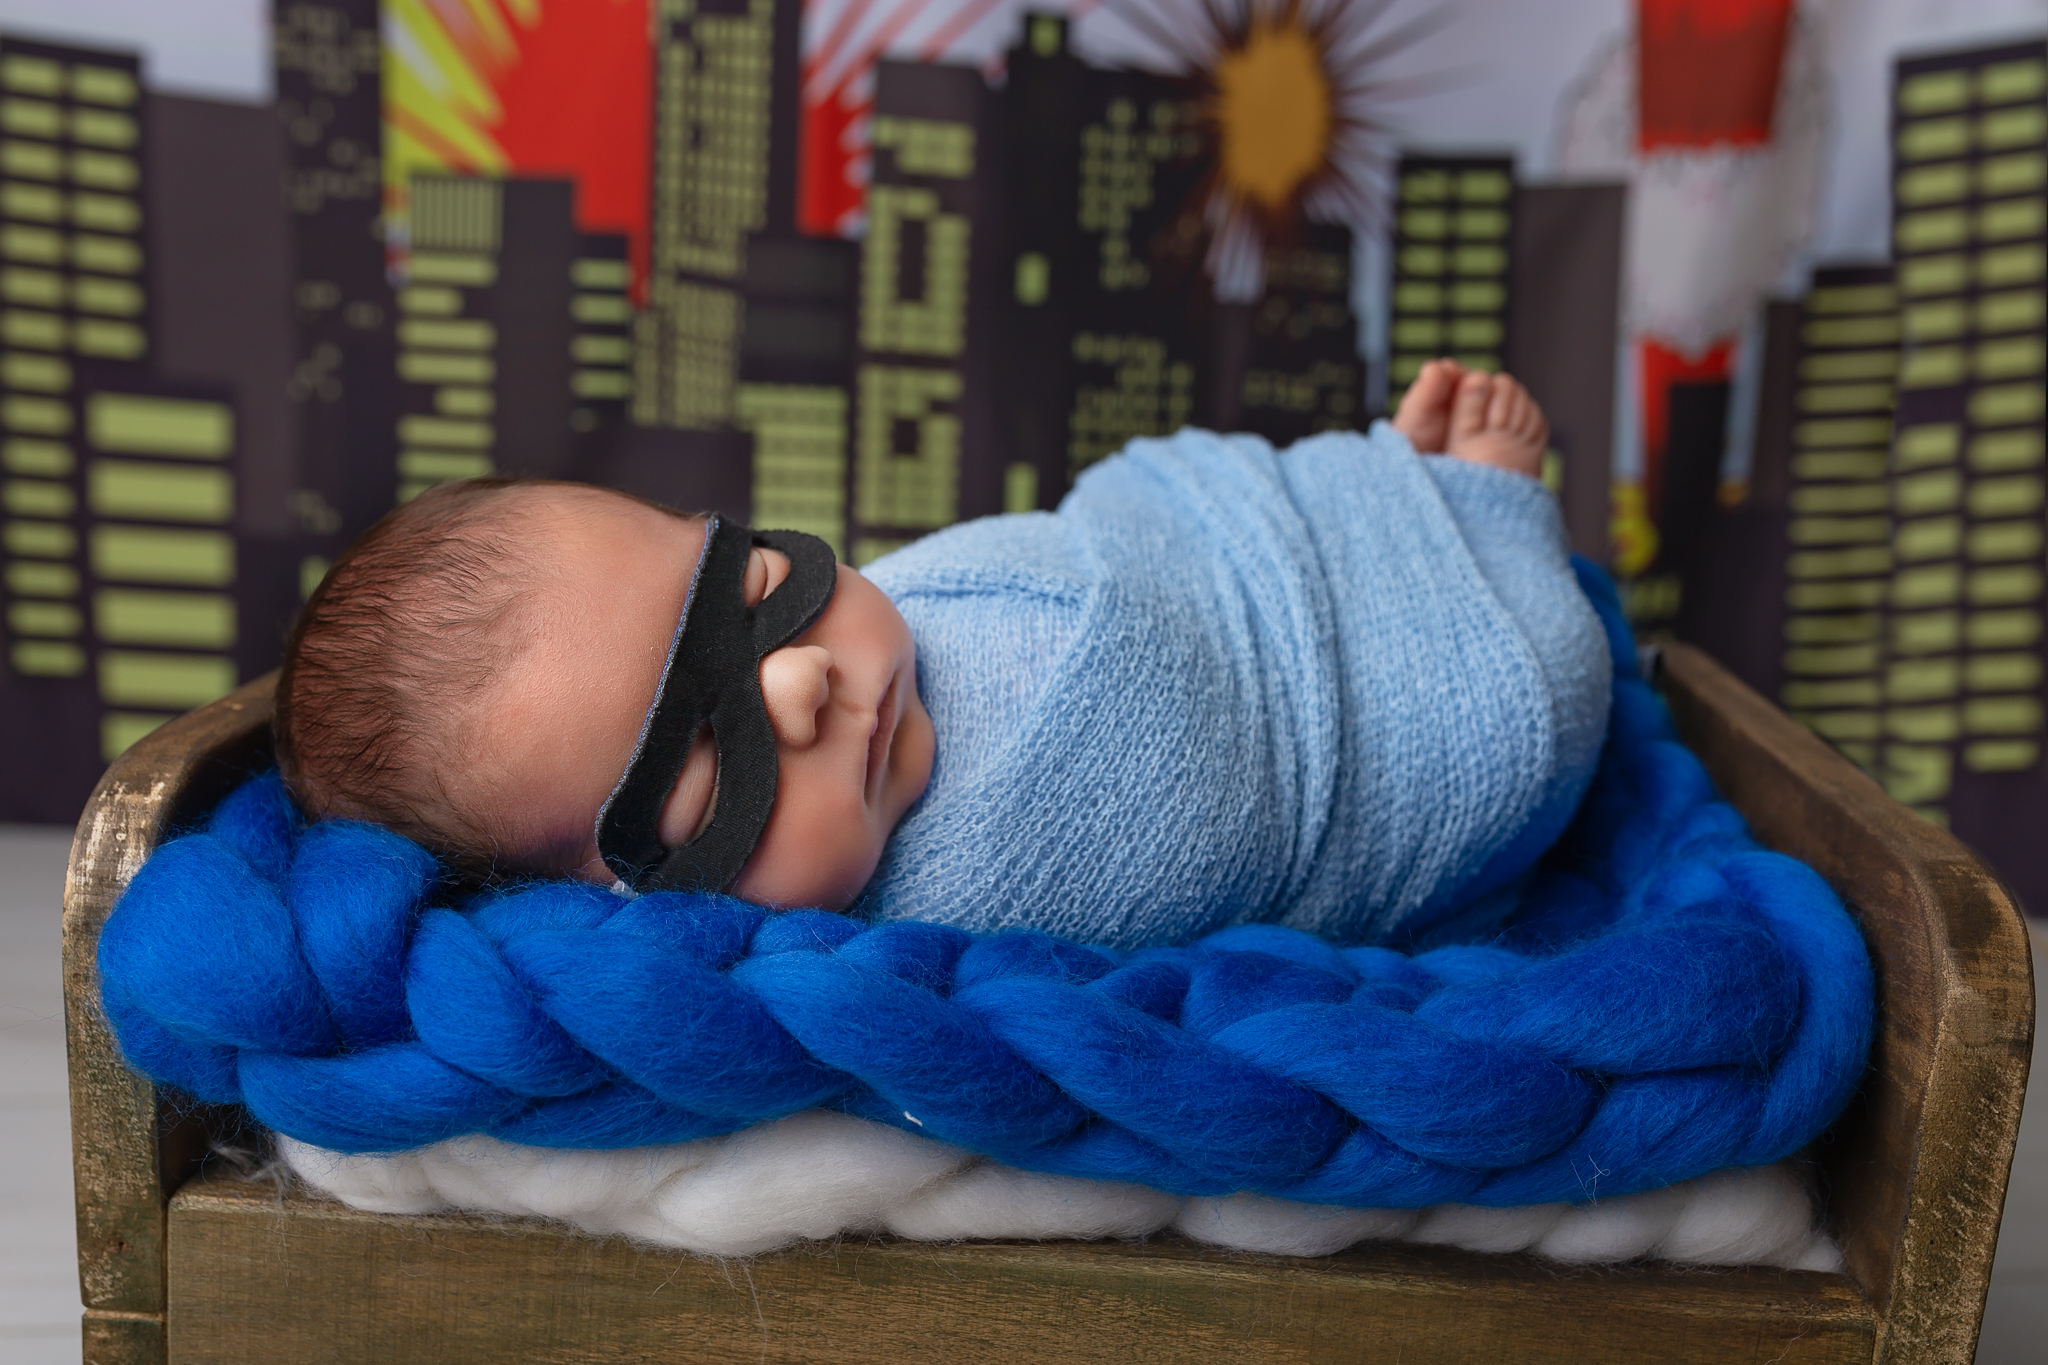 Newborn photographer Leeds, York, Bradford, Harrogate, Wakefield: newborn baby boy styled as a superhero during his newborn photoshoot in Leeds, West Yorkshire